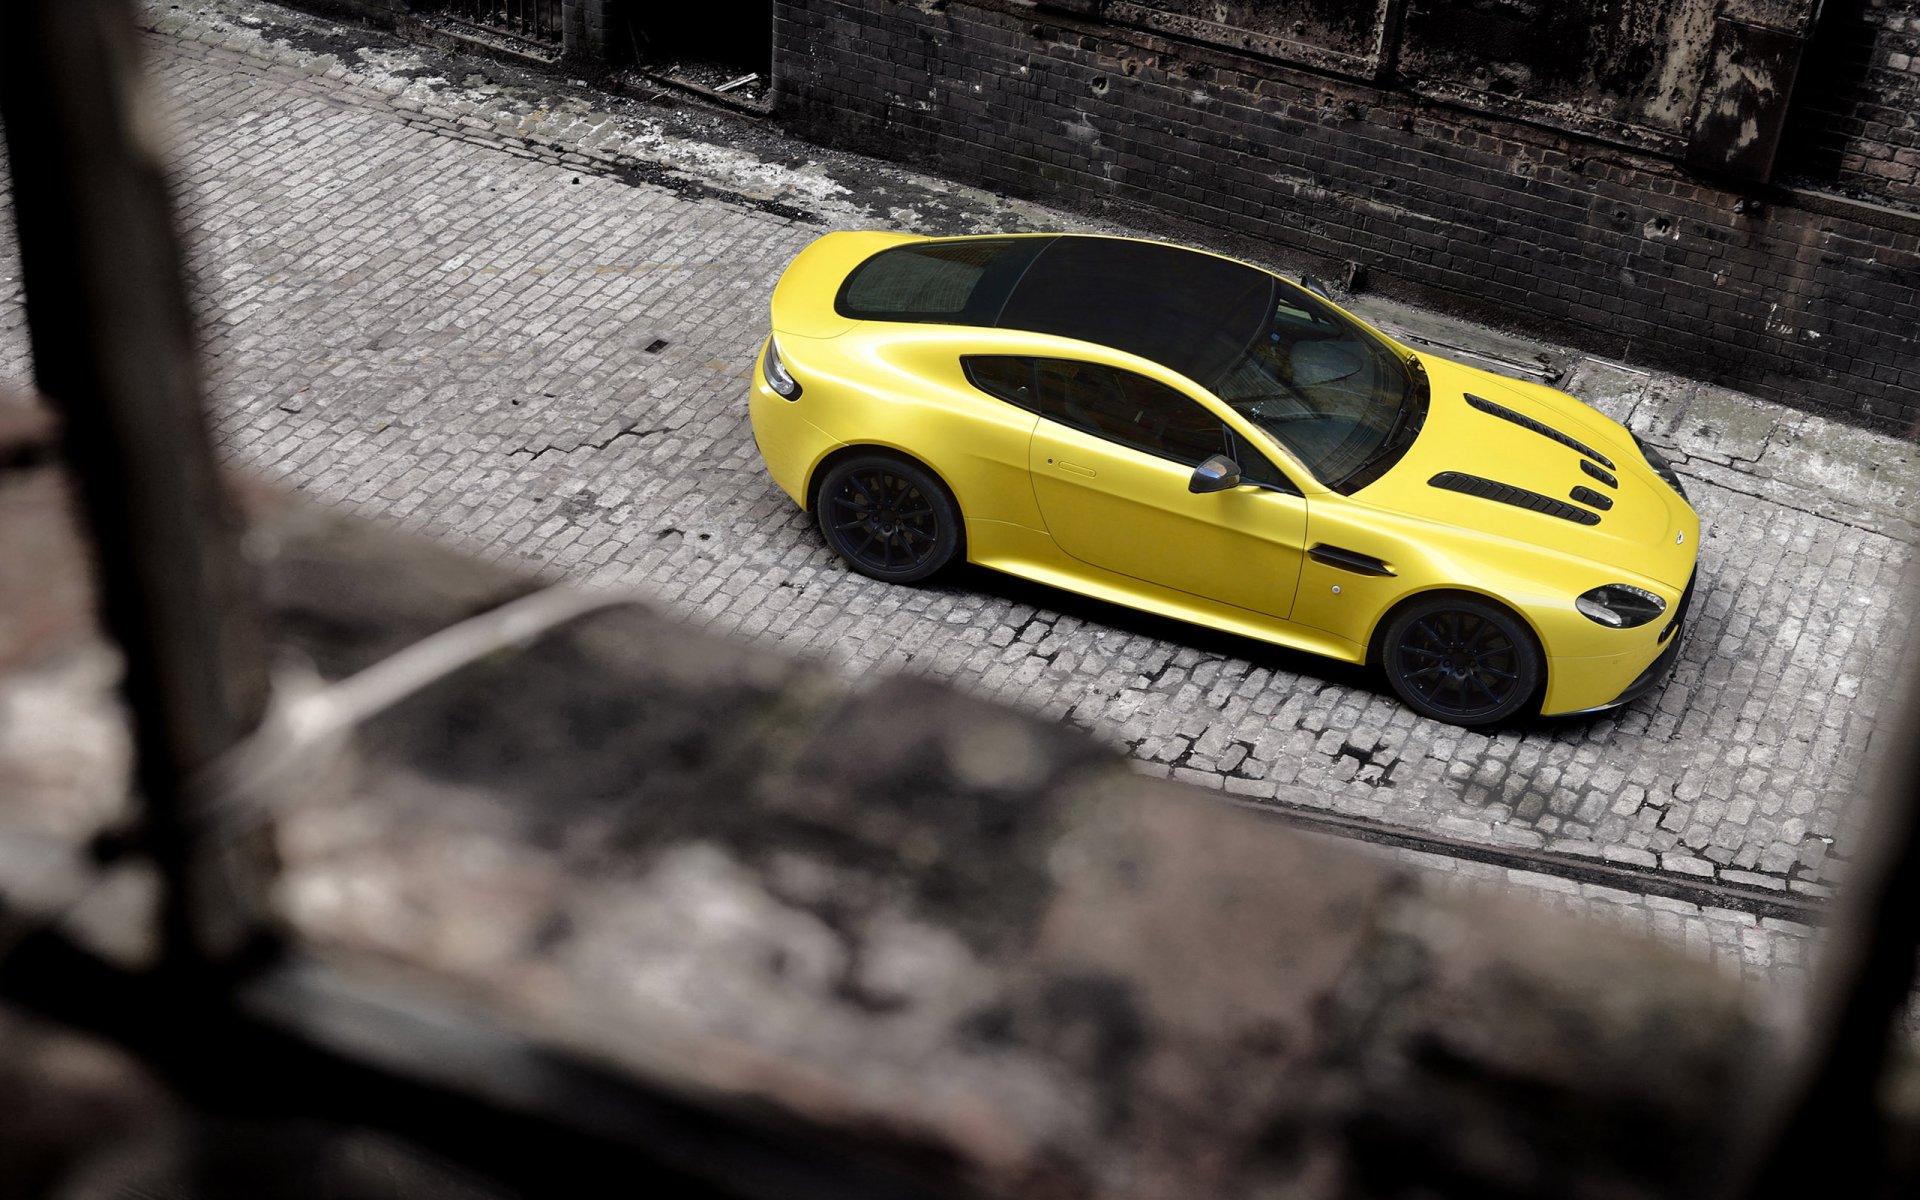 40 Aston Martin V12 Vantage Hd Wallpapers Background Images